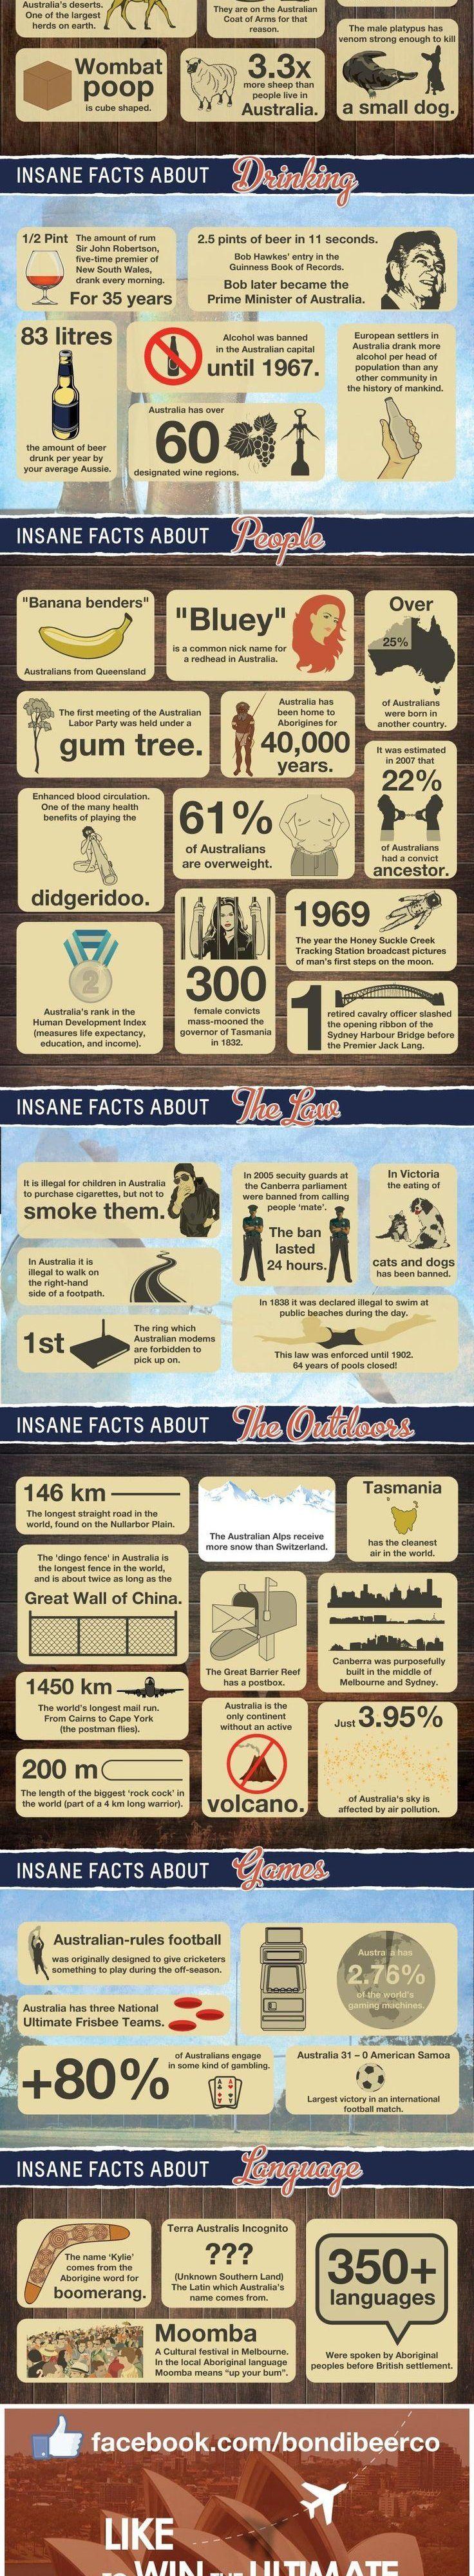 ★☯★ 50 #insane facts about #Australia ★☯★            #OMG #tips #Trick #Goodies #Stuff #weird #bizarre #Strange #Odd #unusual #Fun #Funny #amazing  #inspirational #inspiration